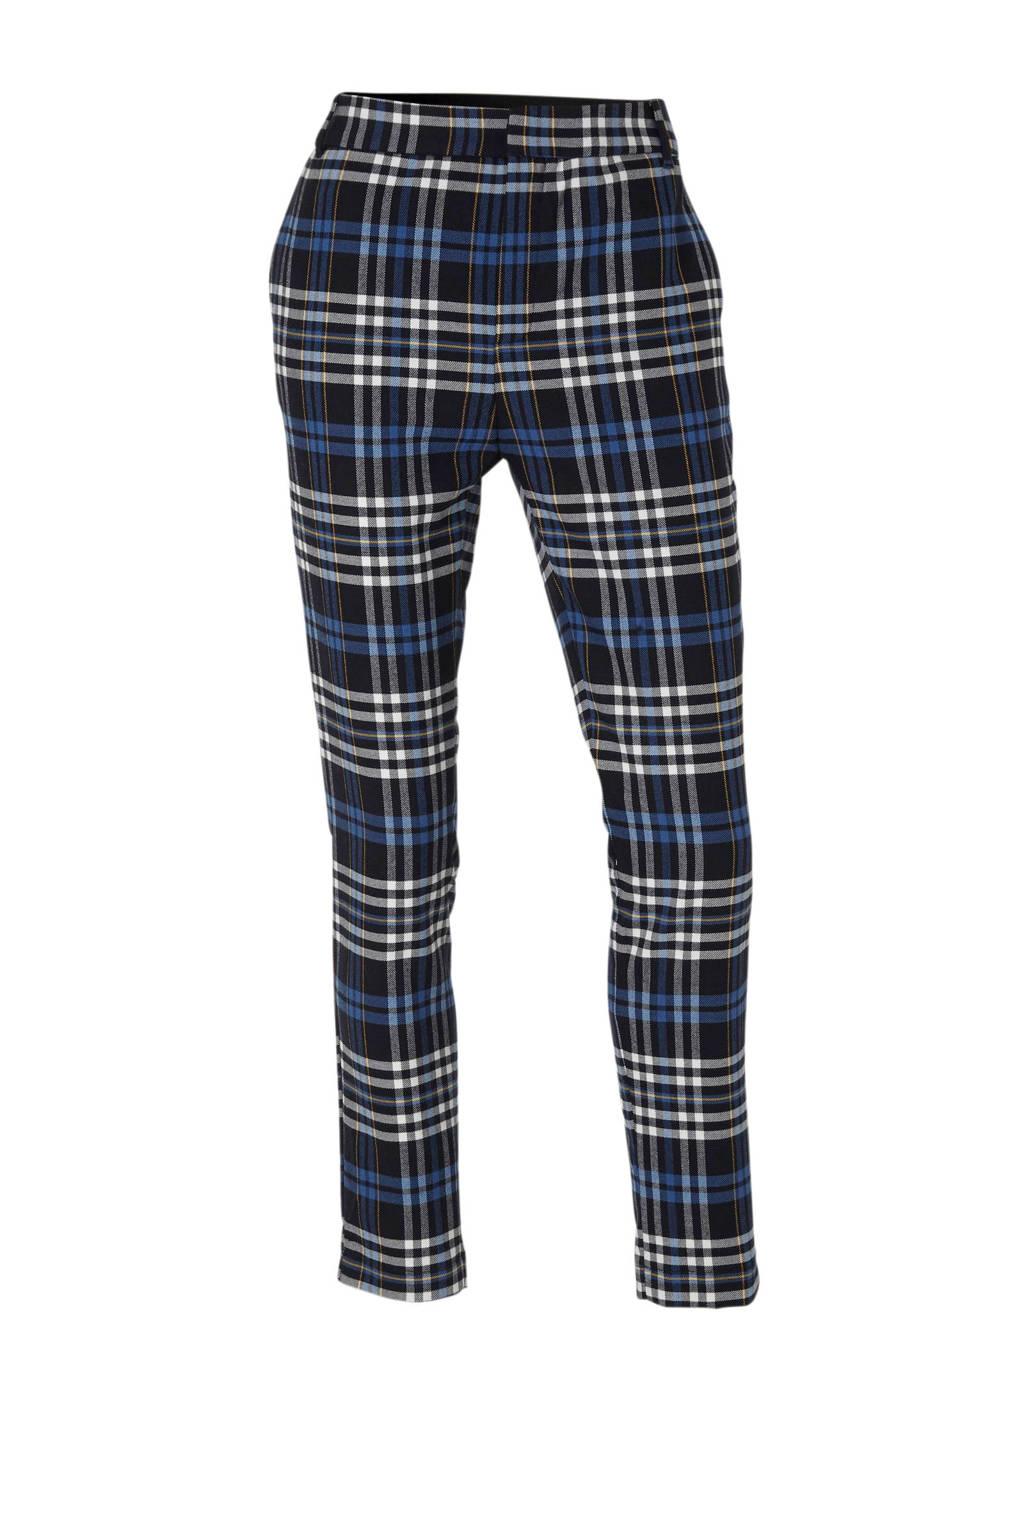 C&A Yessica geruite high waist straight fit pantalon donkerblauw/wit, Donkerblauw/wit